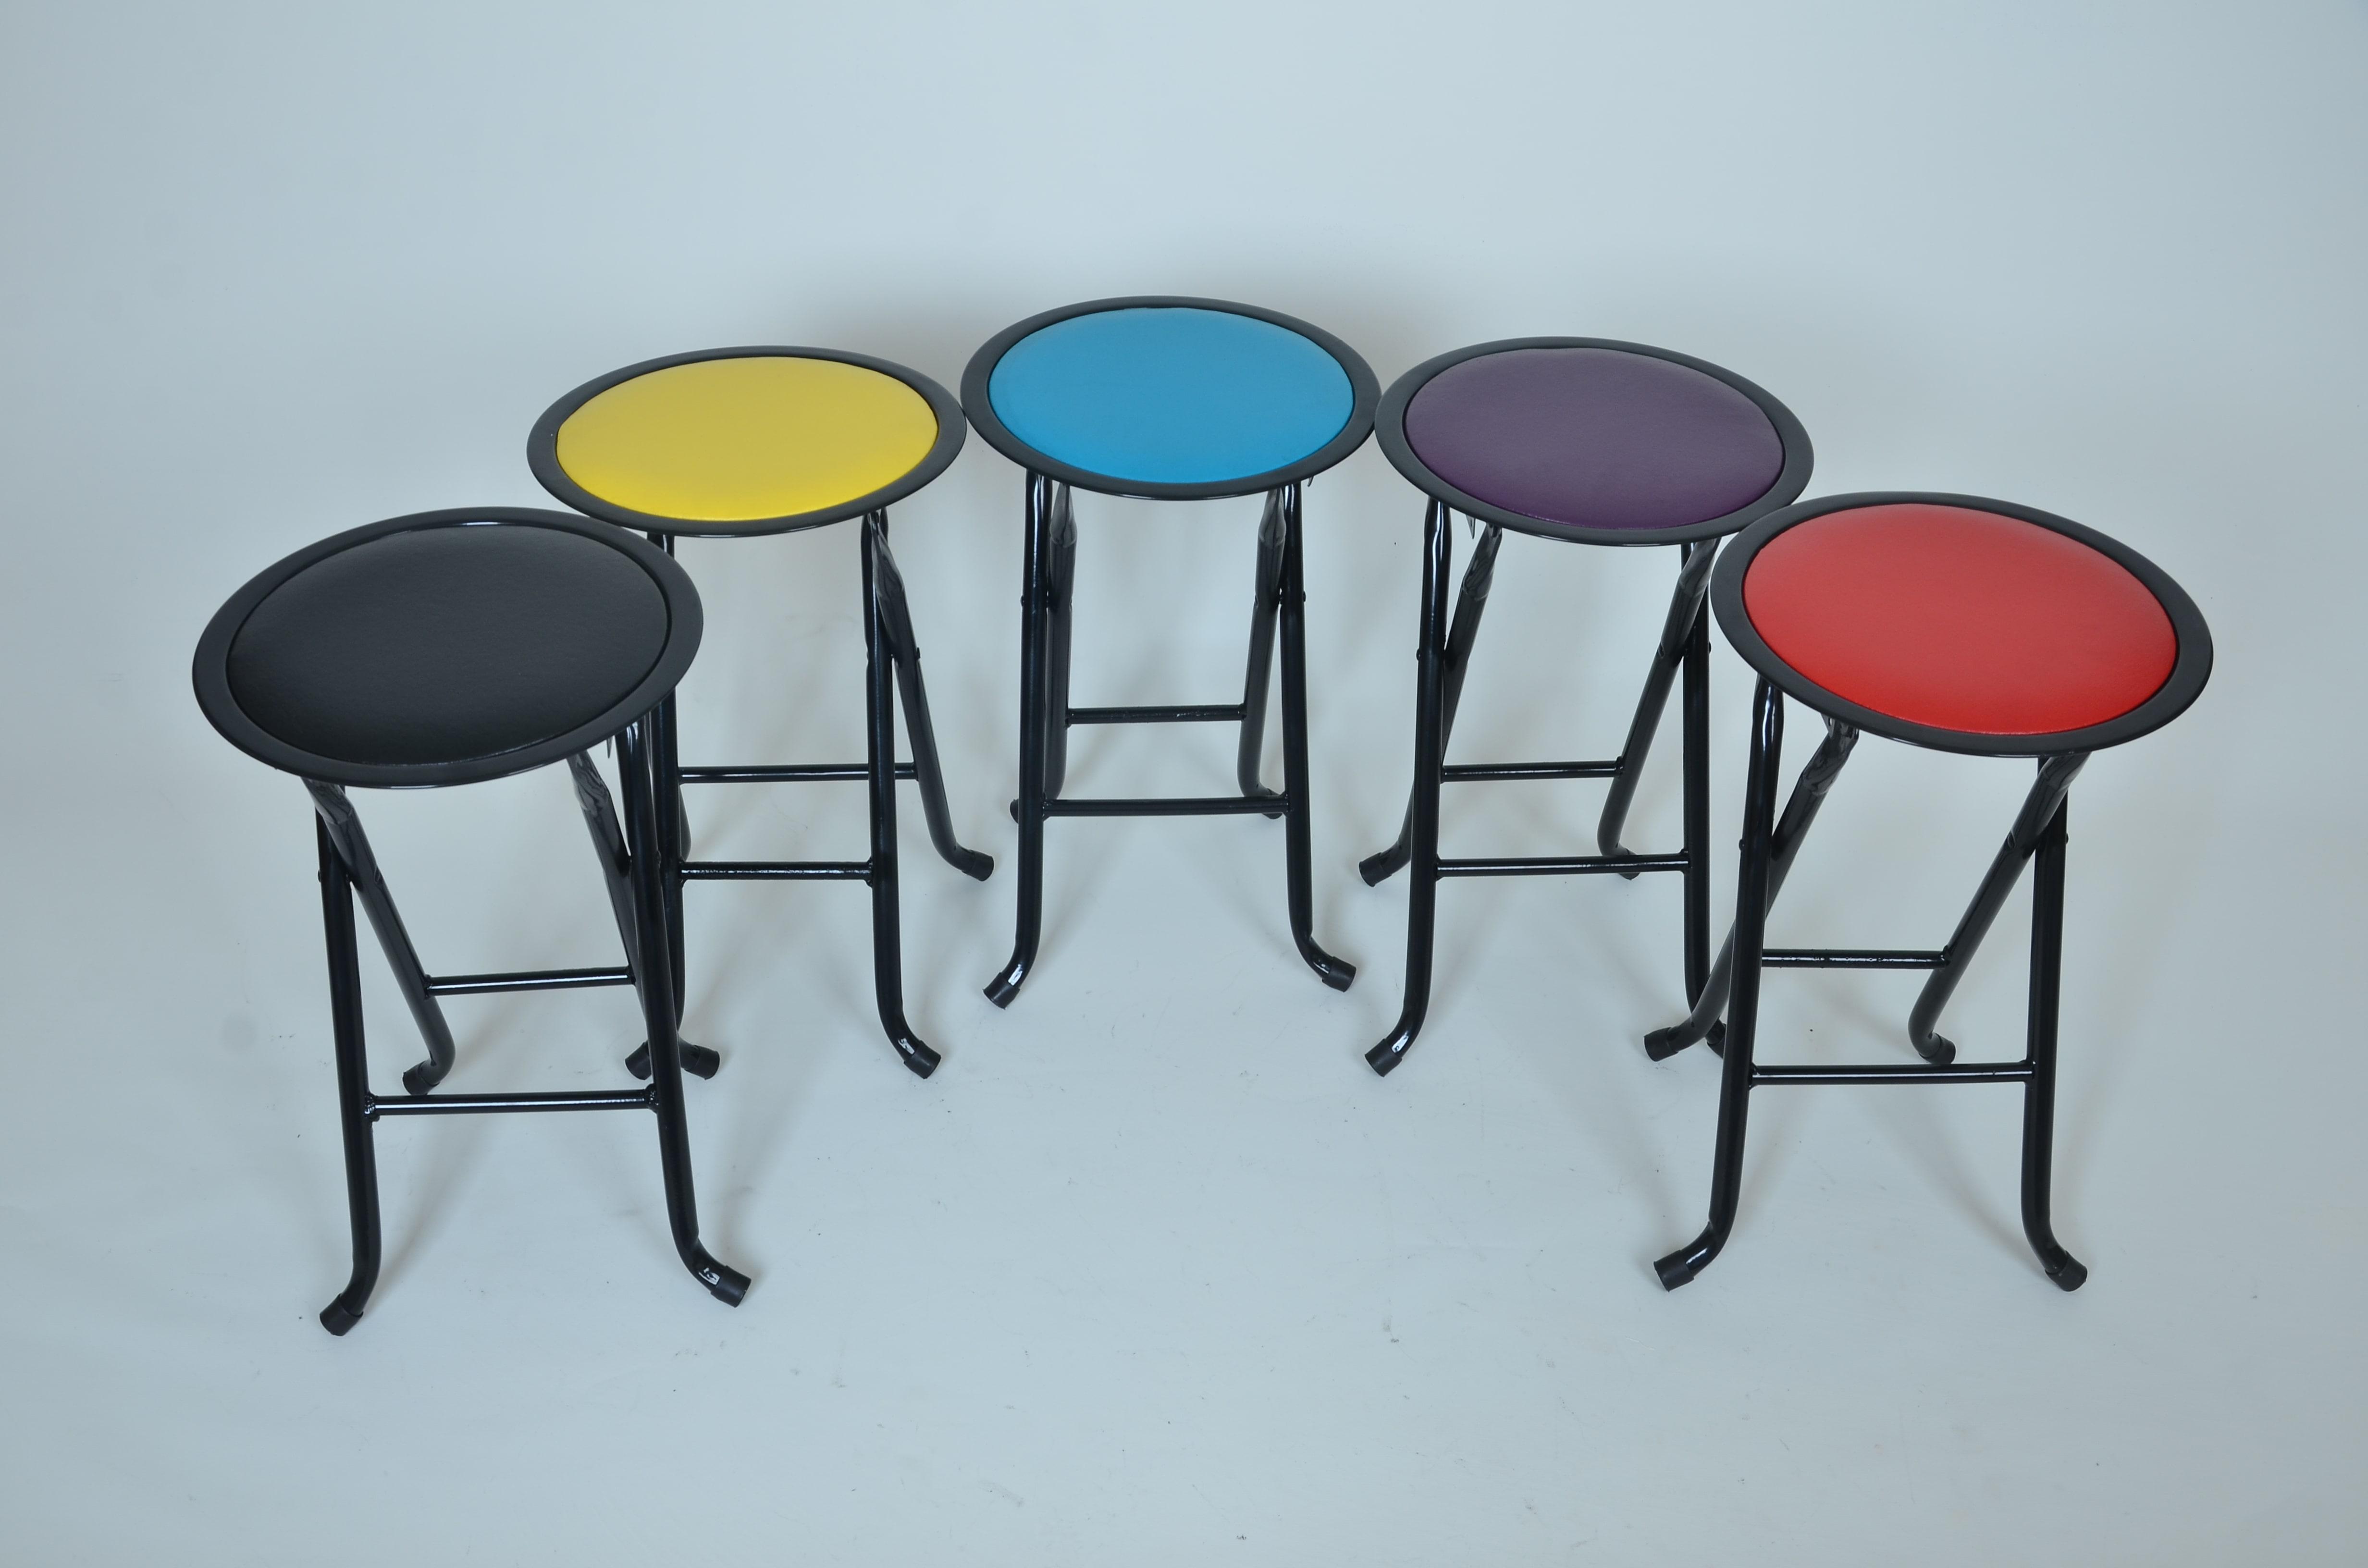 Складной стул для кемпинга и пикника|Кемпинг табуреты| | АлиЭкспресс